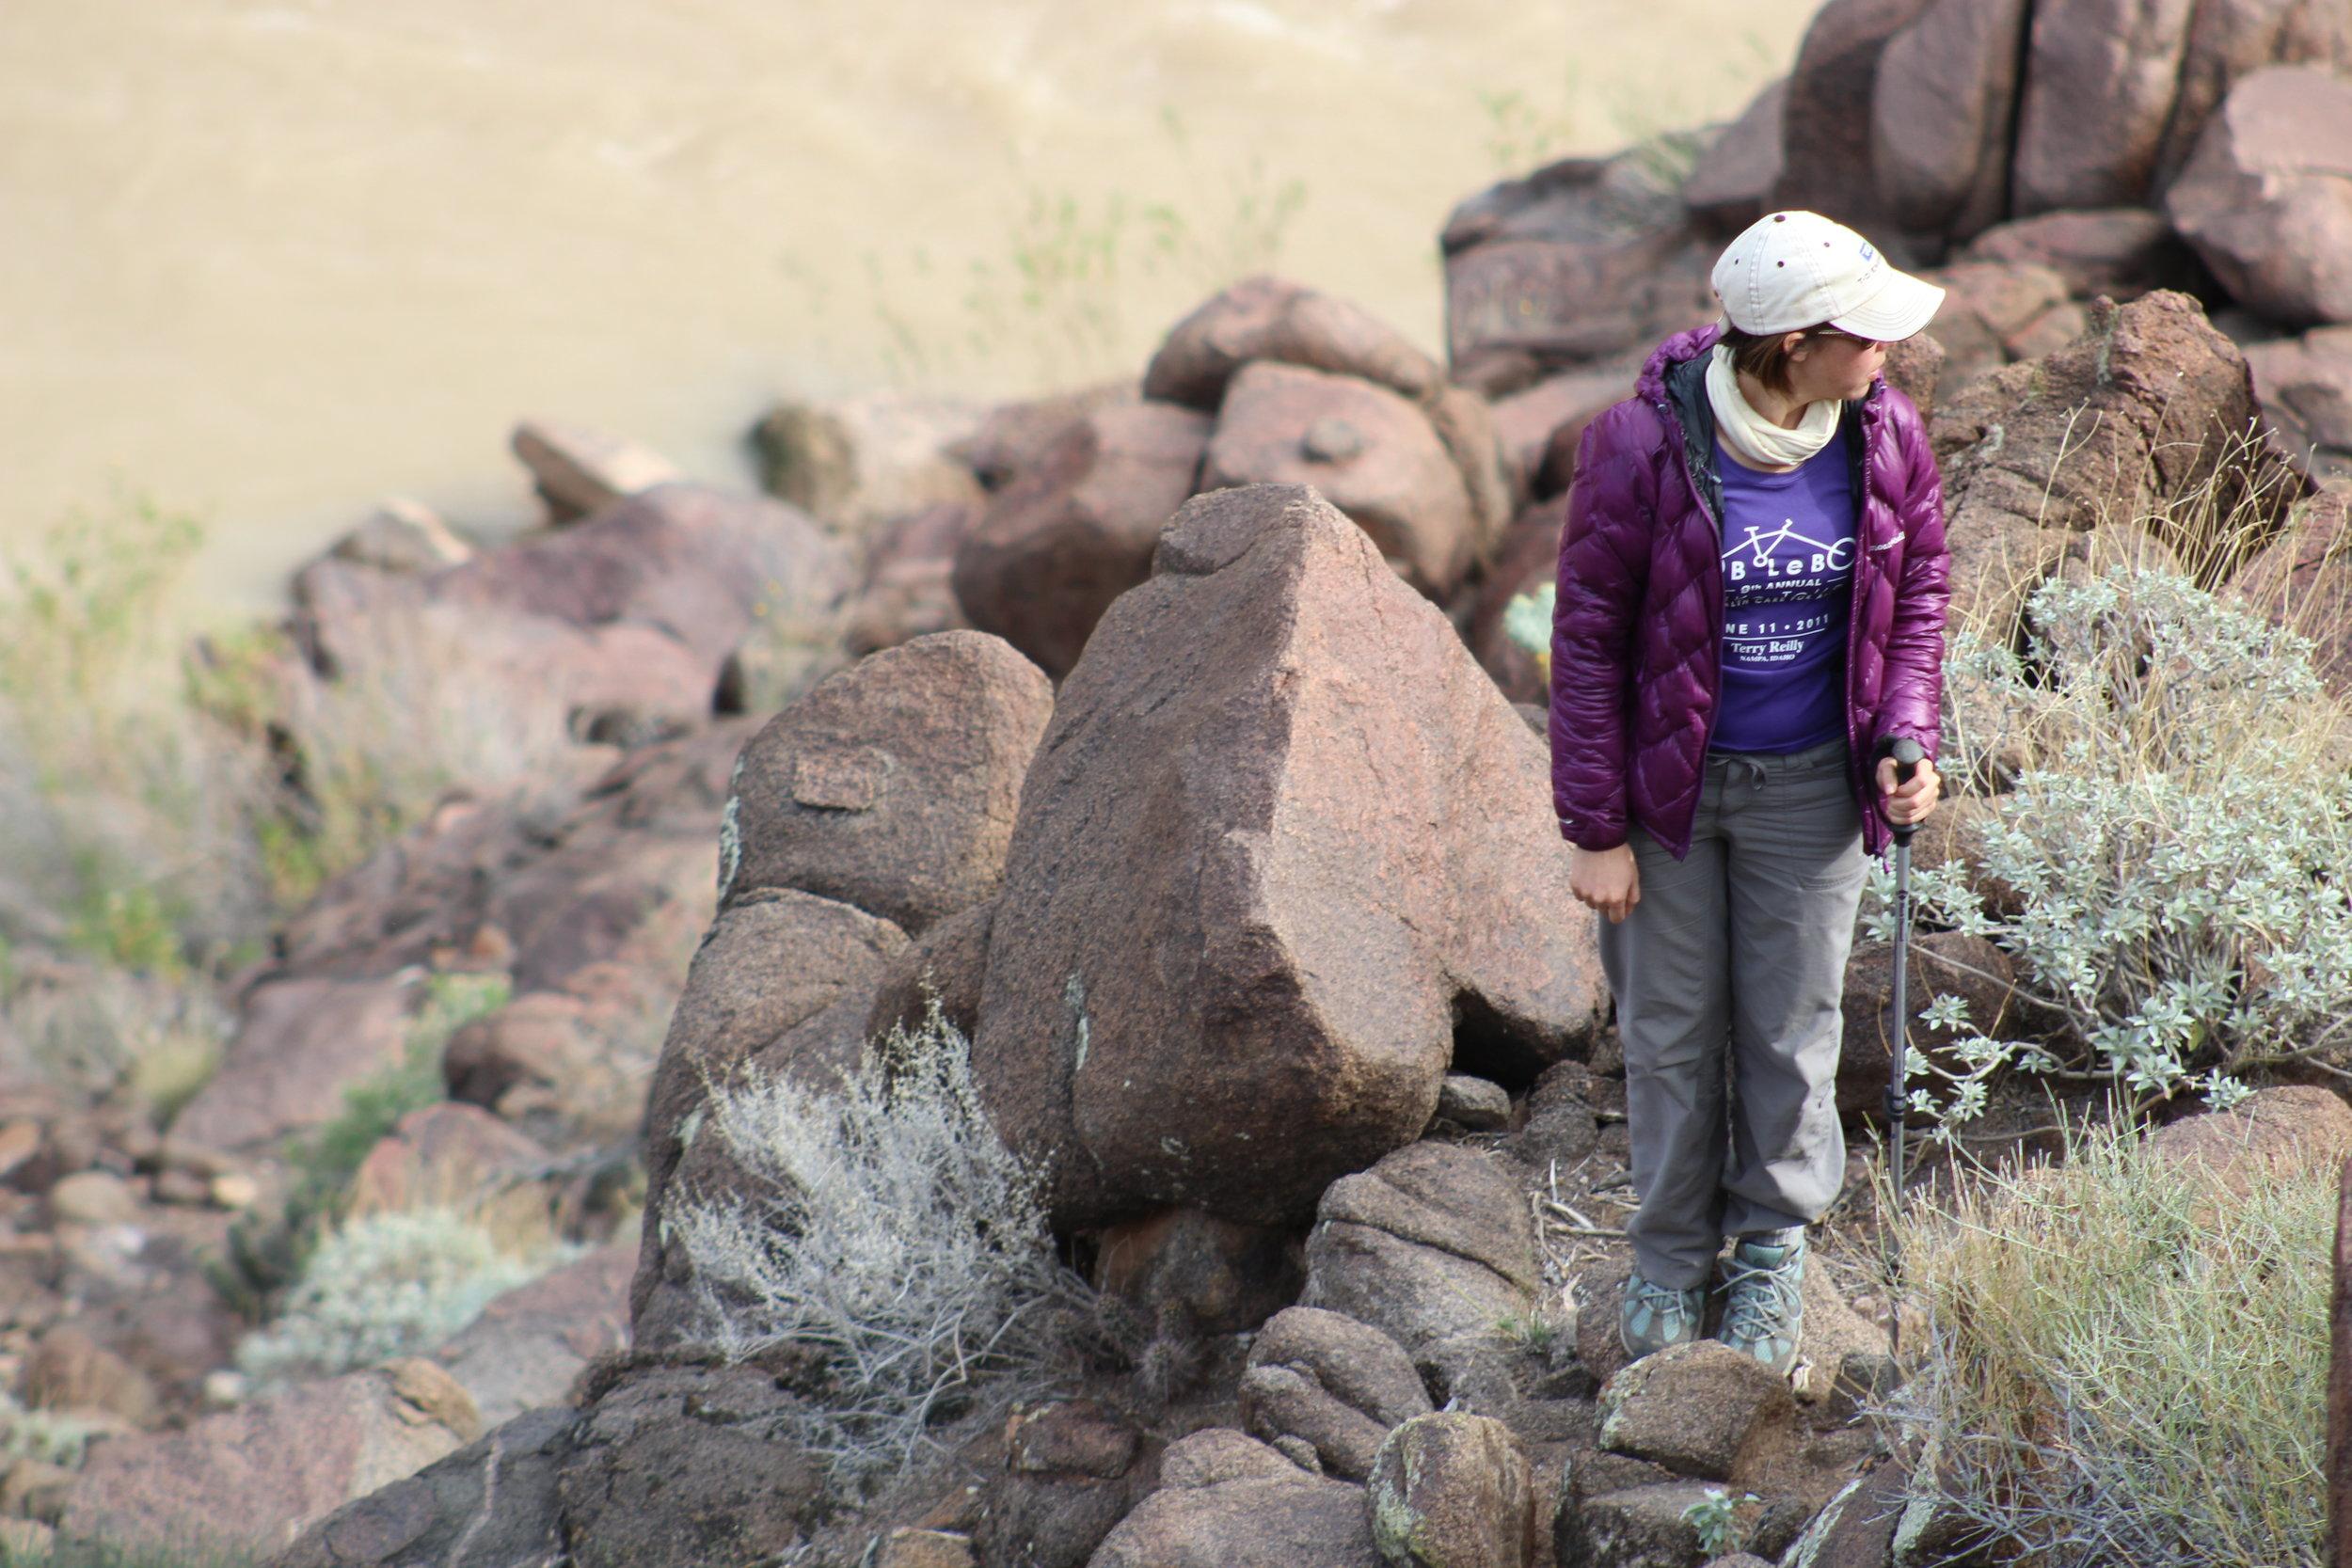 Exploring our campsite.